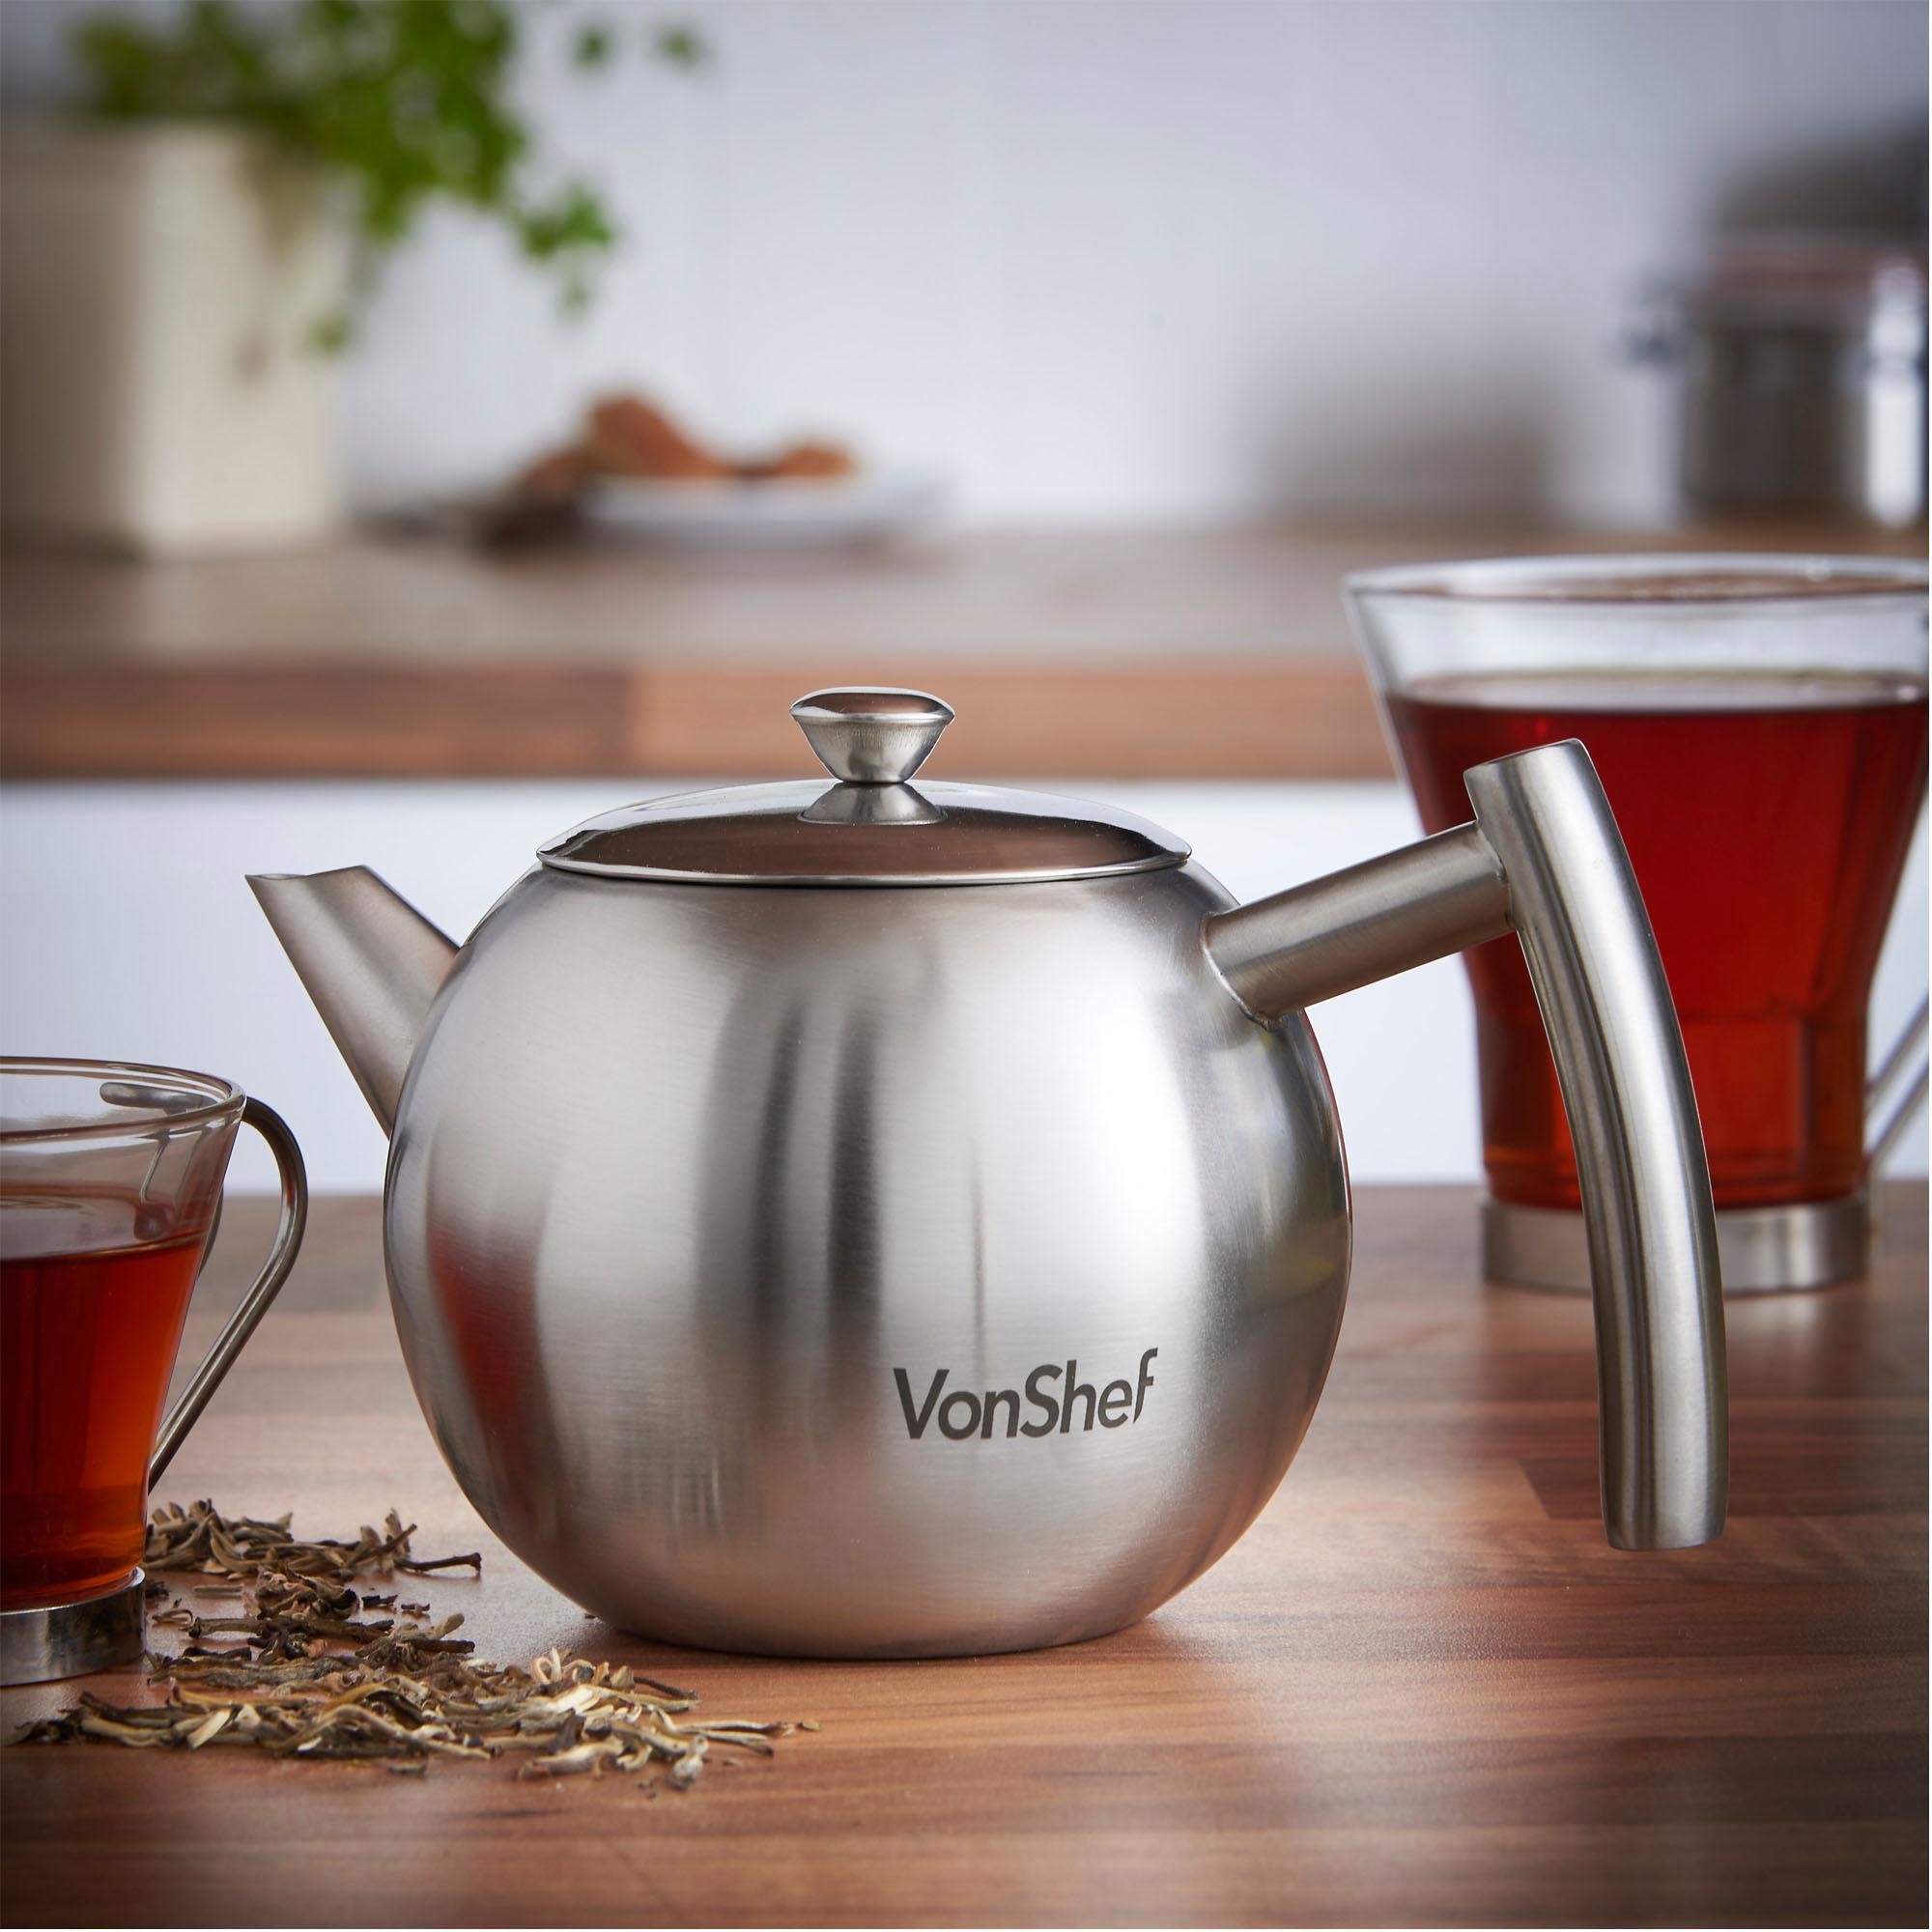 vonshef stainless steel teapot infuser tea pot  ml ml and l - sentinel vonshef teapot variation